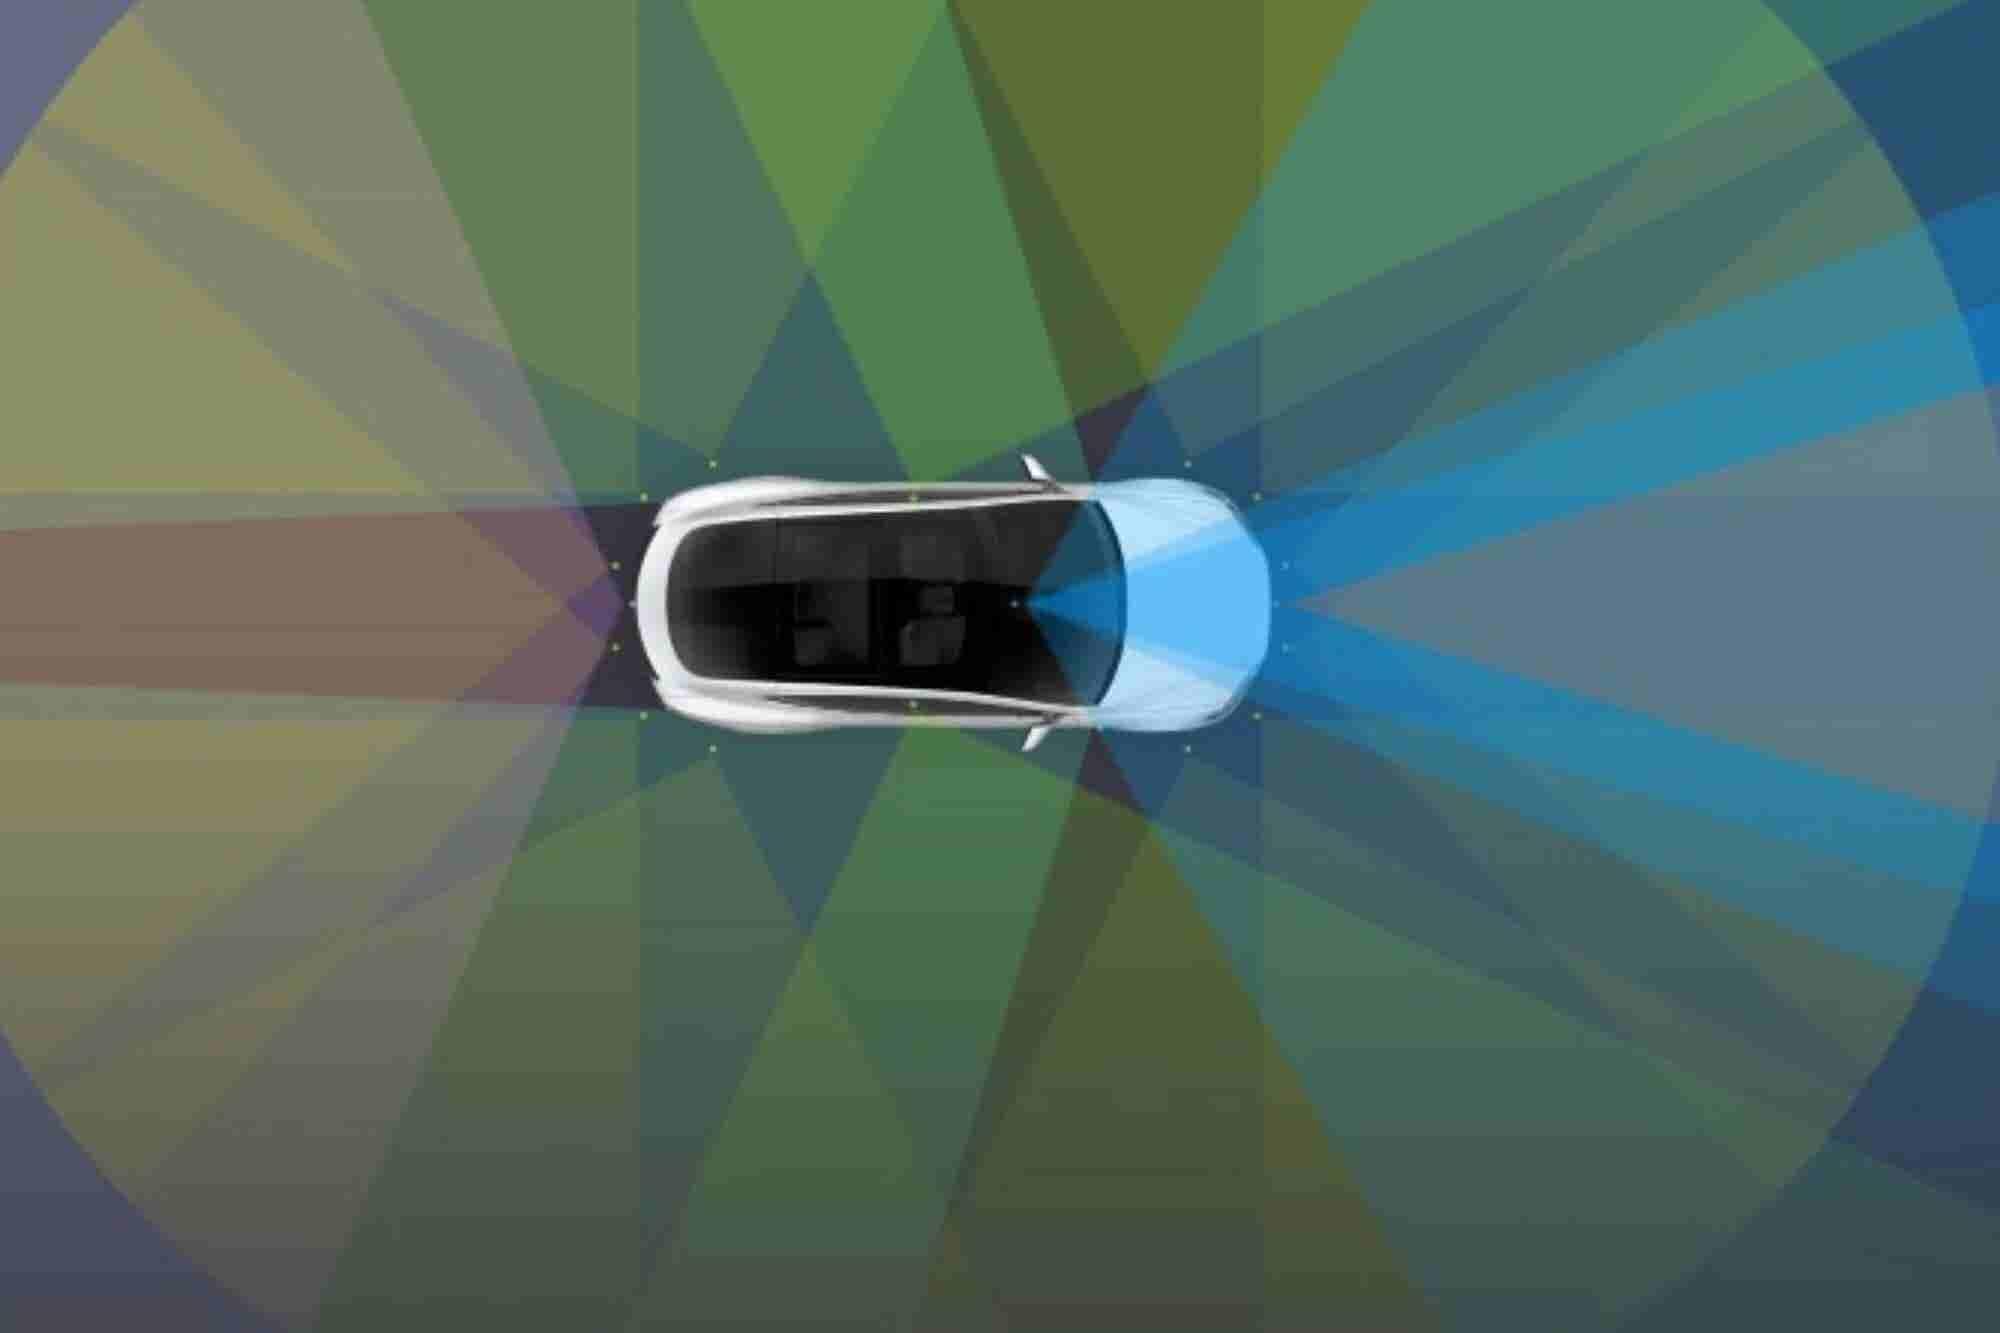 Autopilot Was Engaged During Fatal Tesla Crash